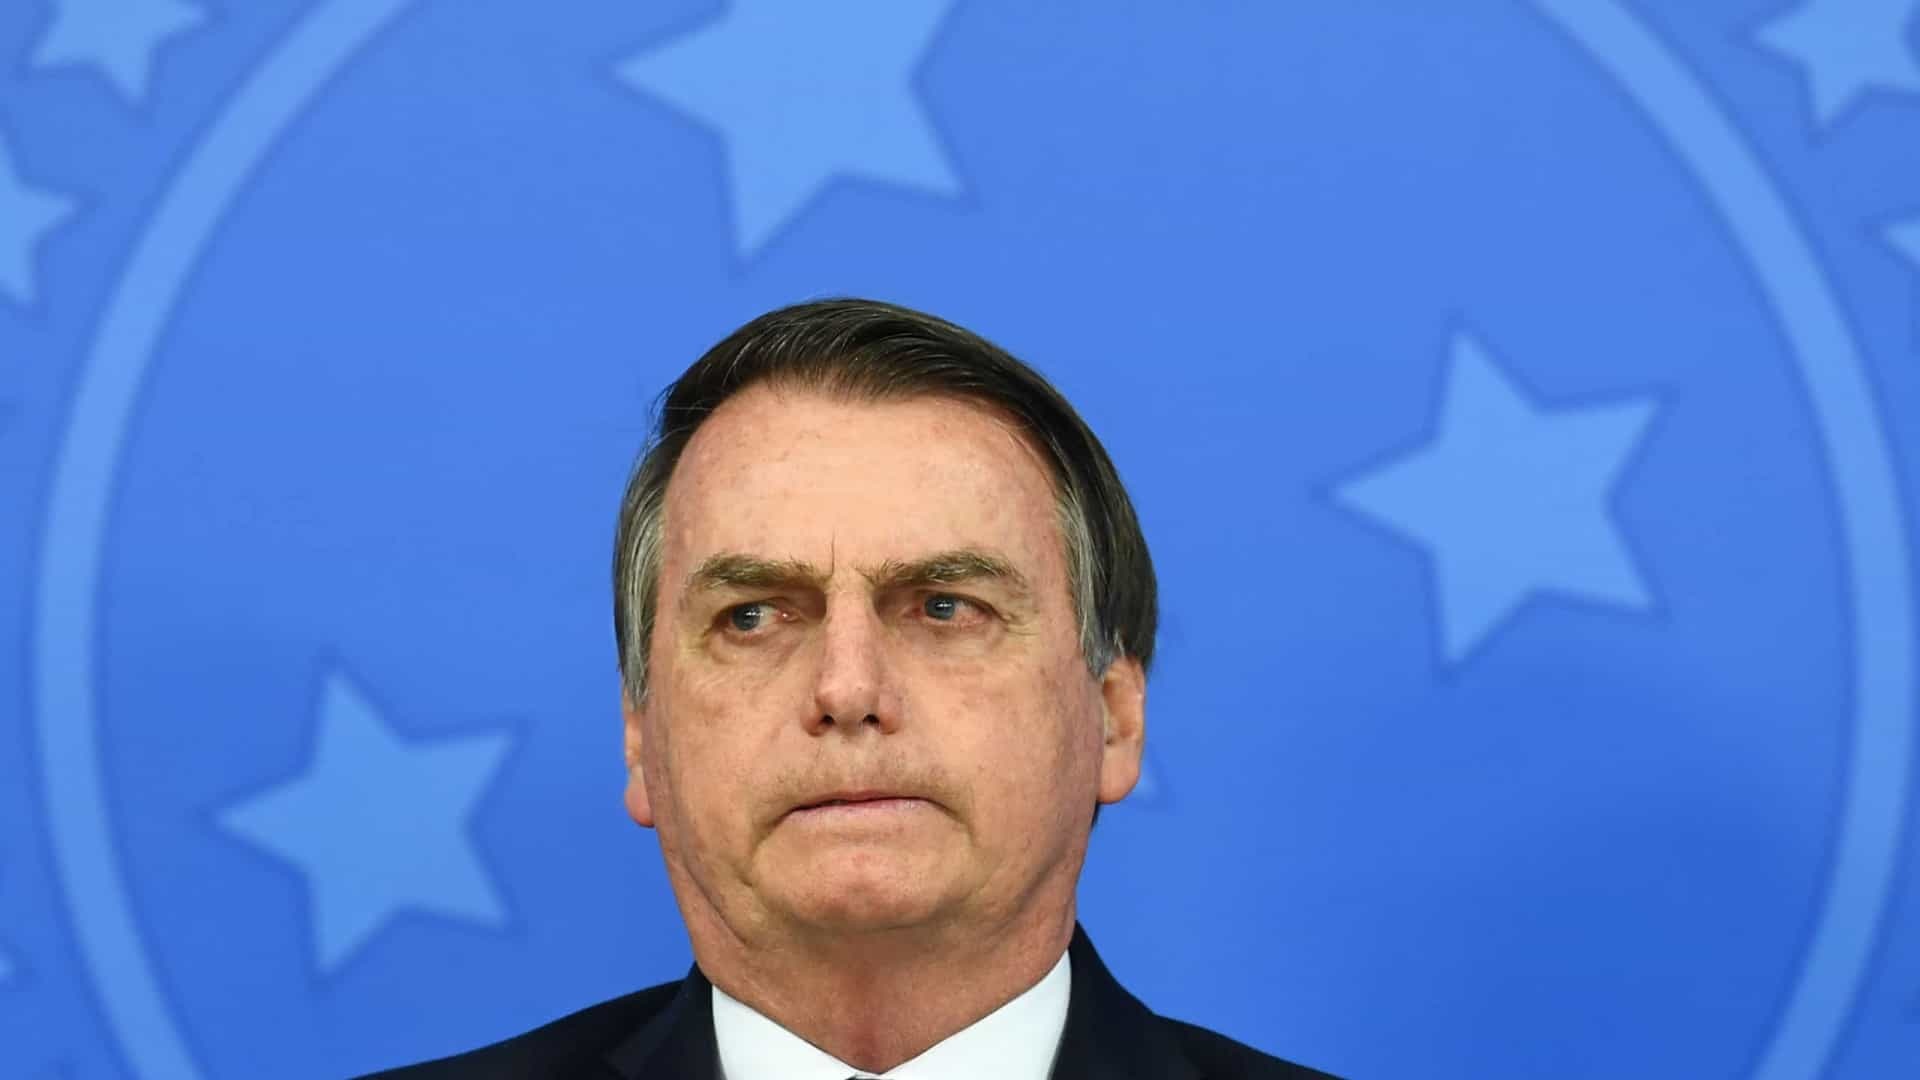 naom 60812667006f8 - Personalidades protocolam pedido de impeachment de Bolsonaro